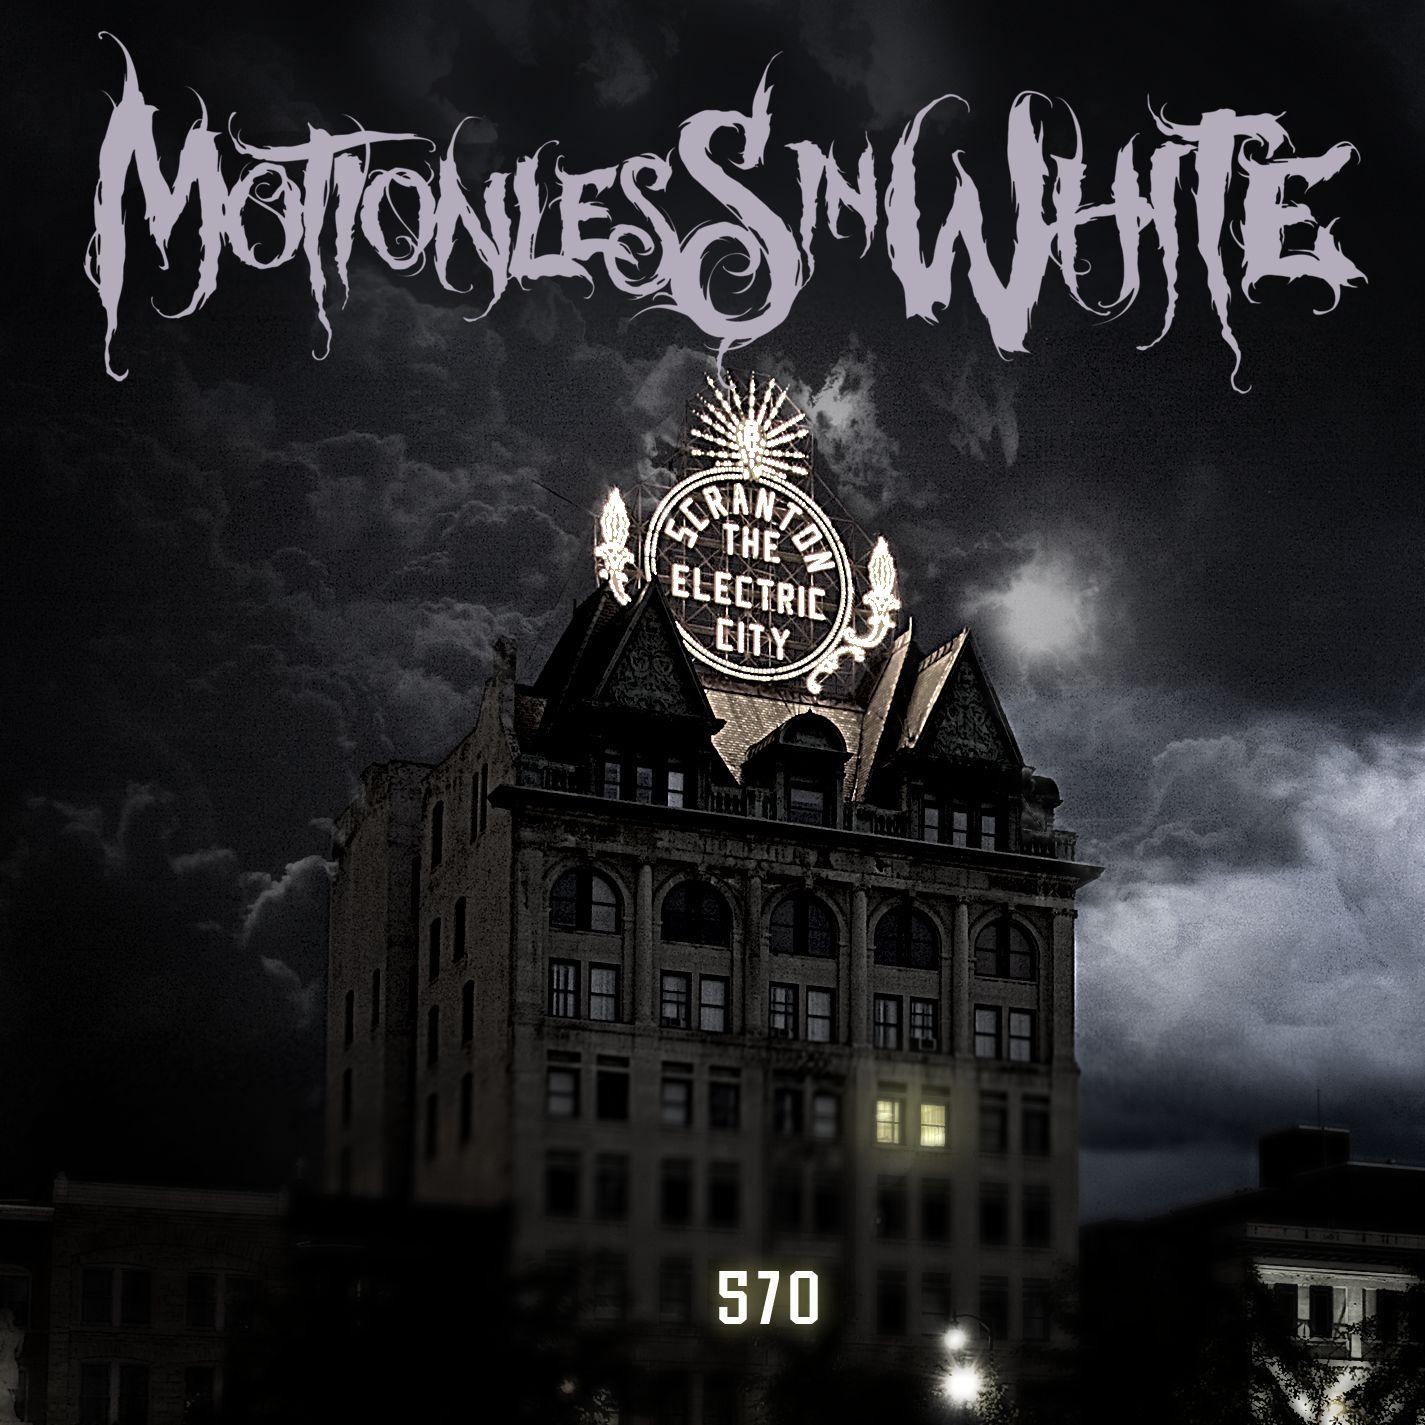 Motionless In White - 570 [single] (2016)